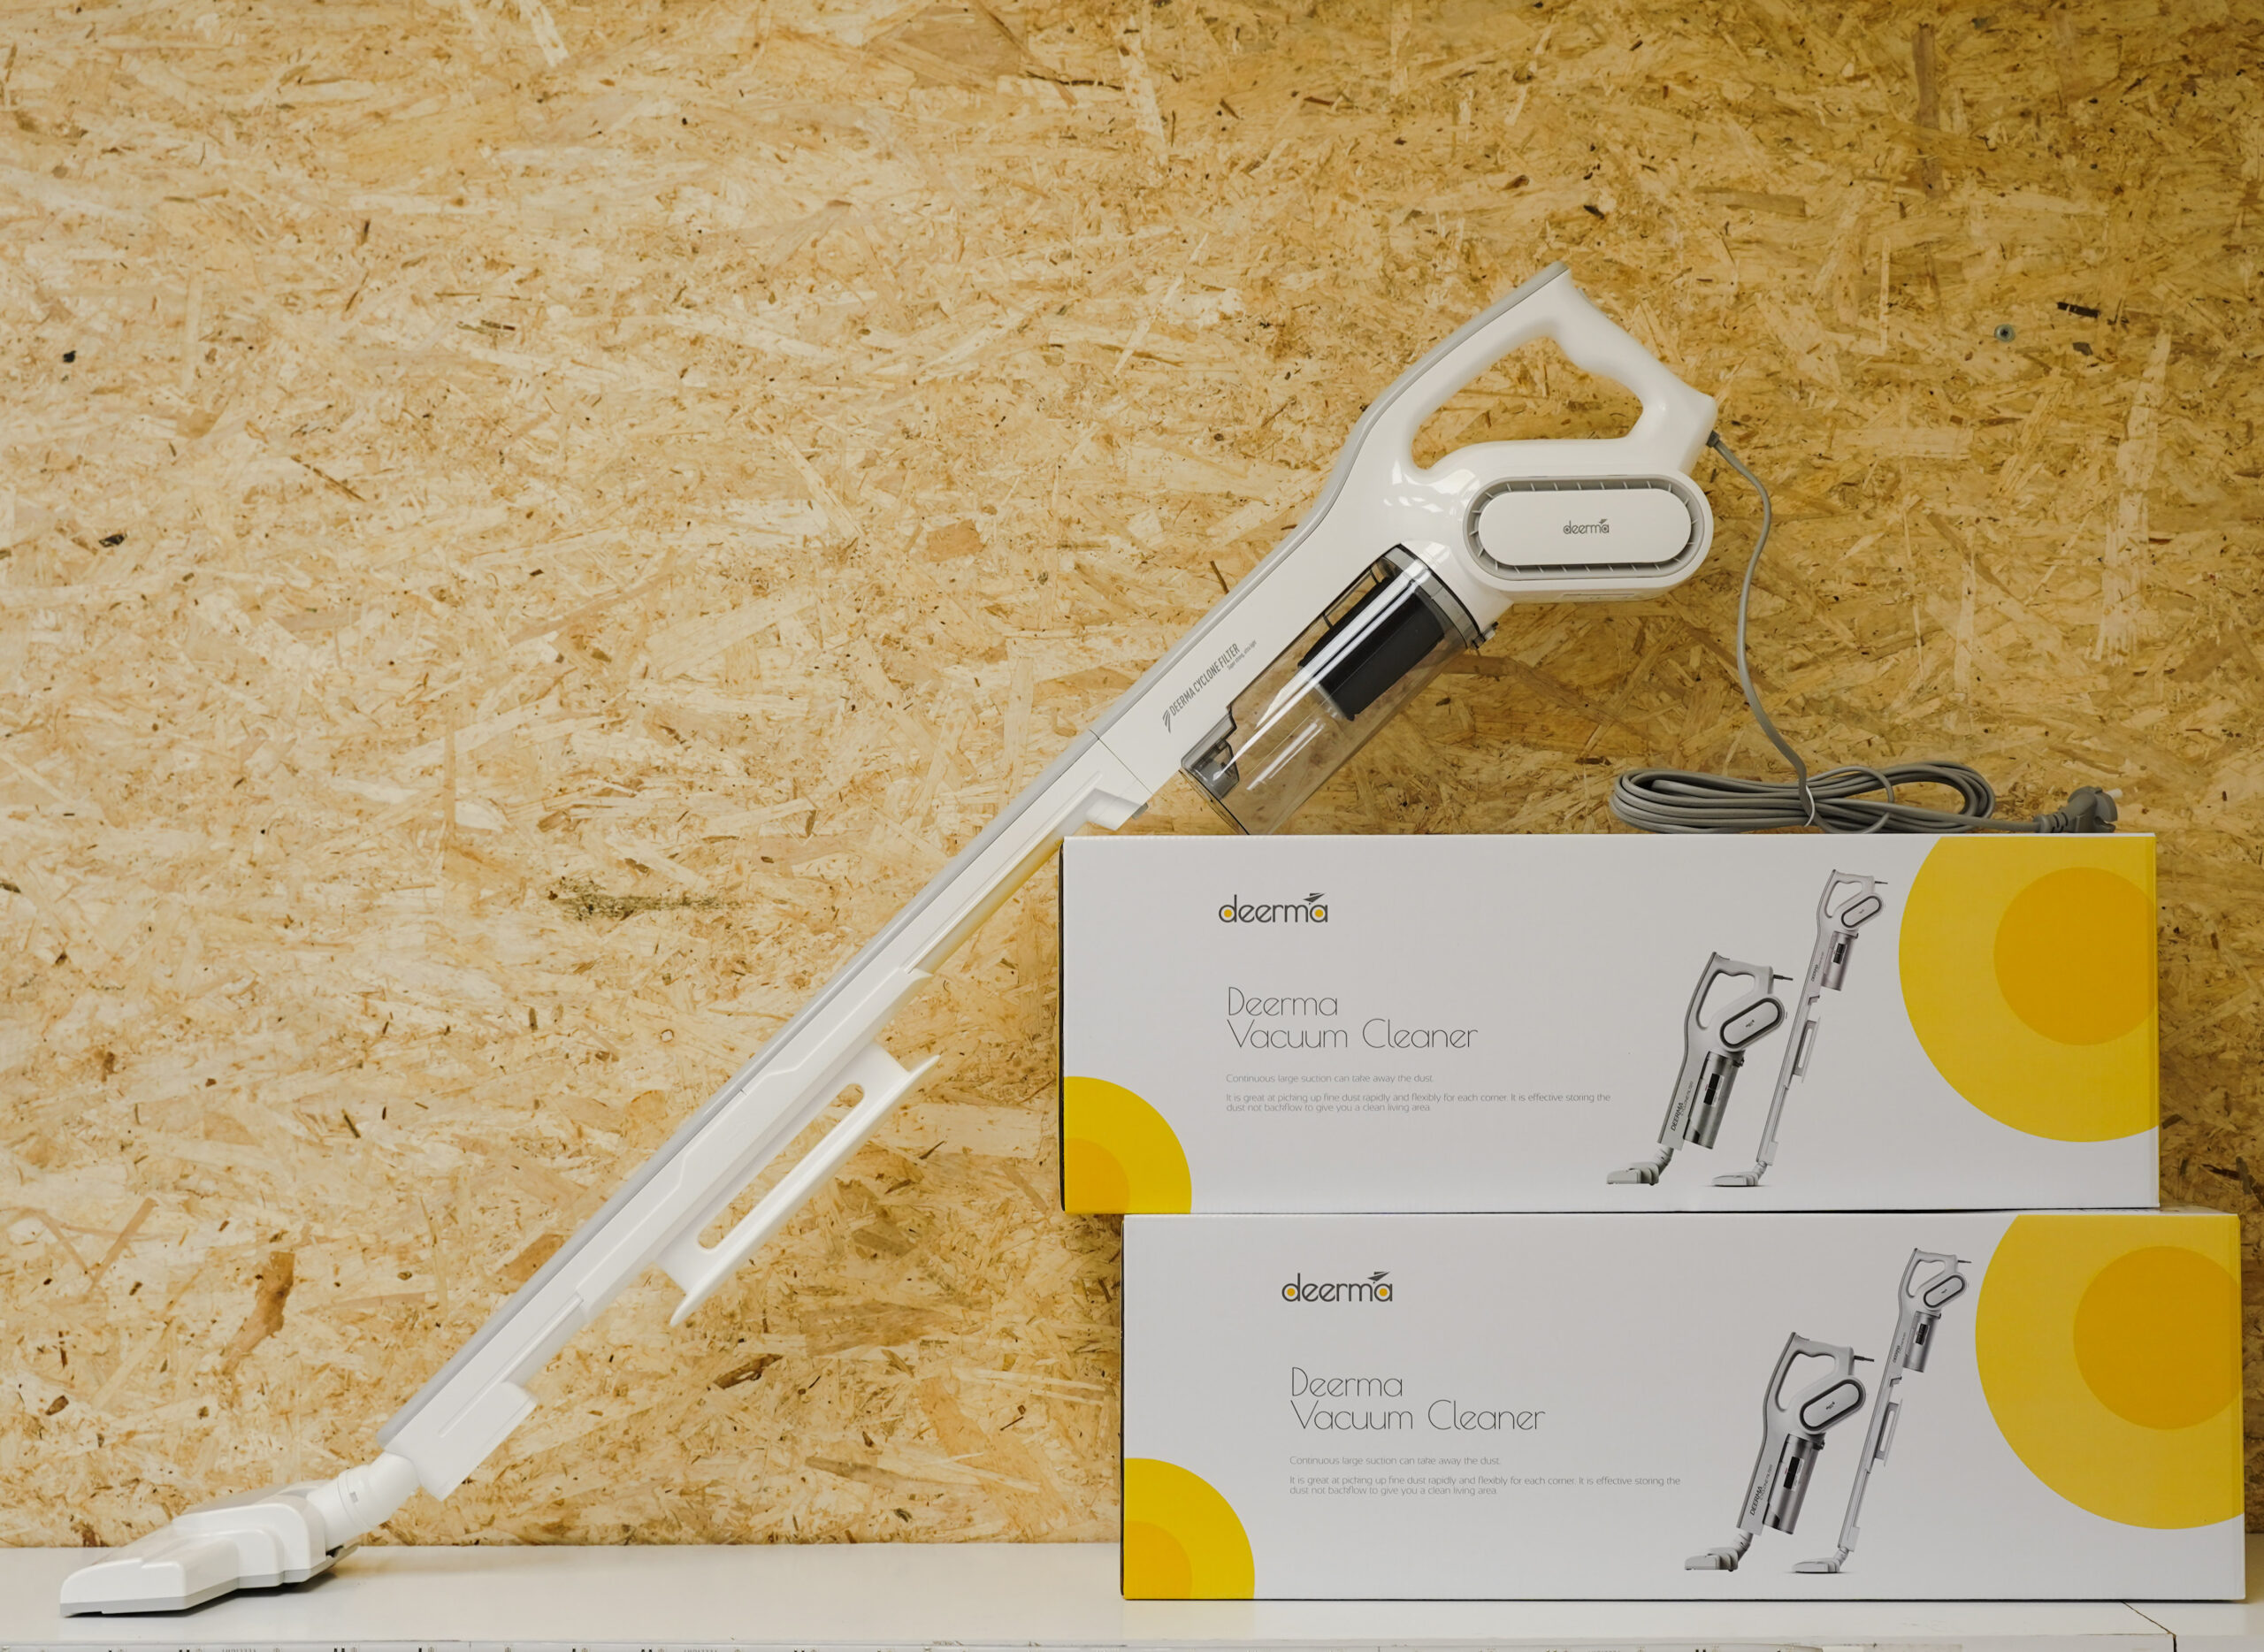 Aspirador Vertical Xiaomi Deerma DX700 Handheld Vacuum Cleaner 2-Em-1